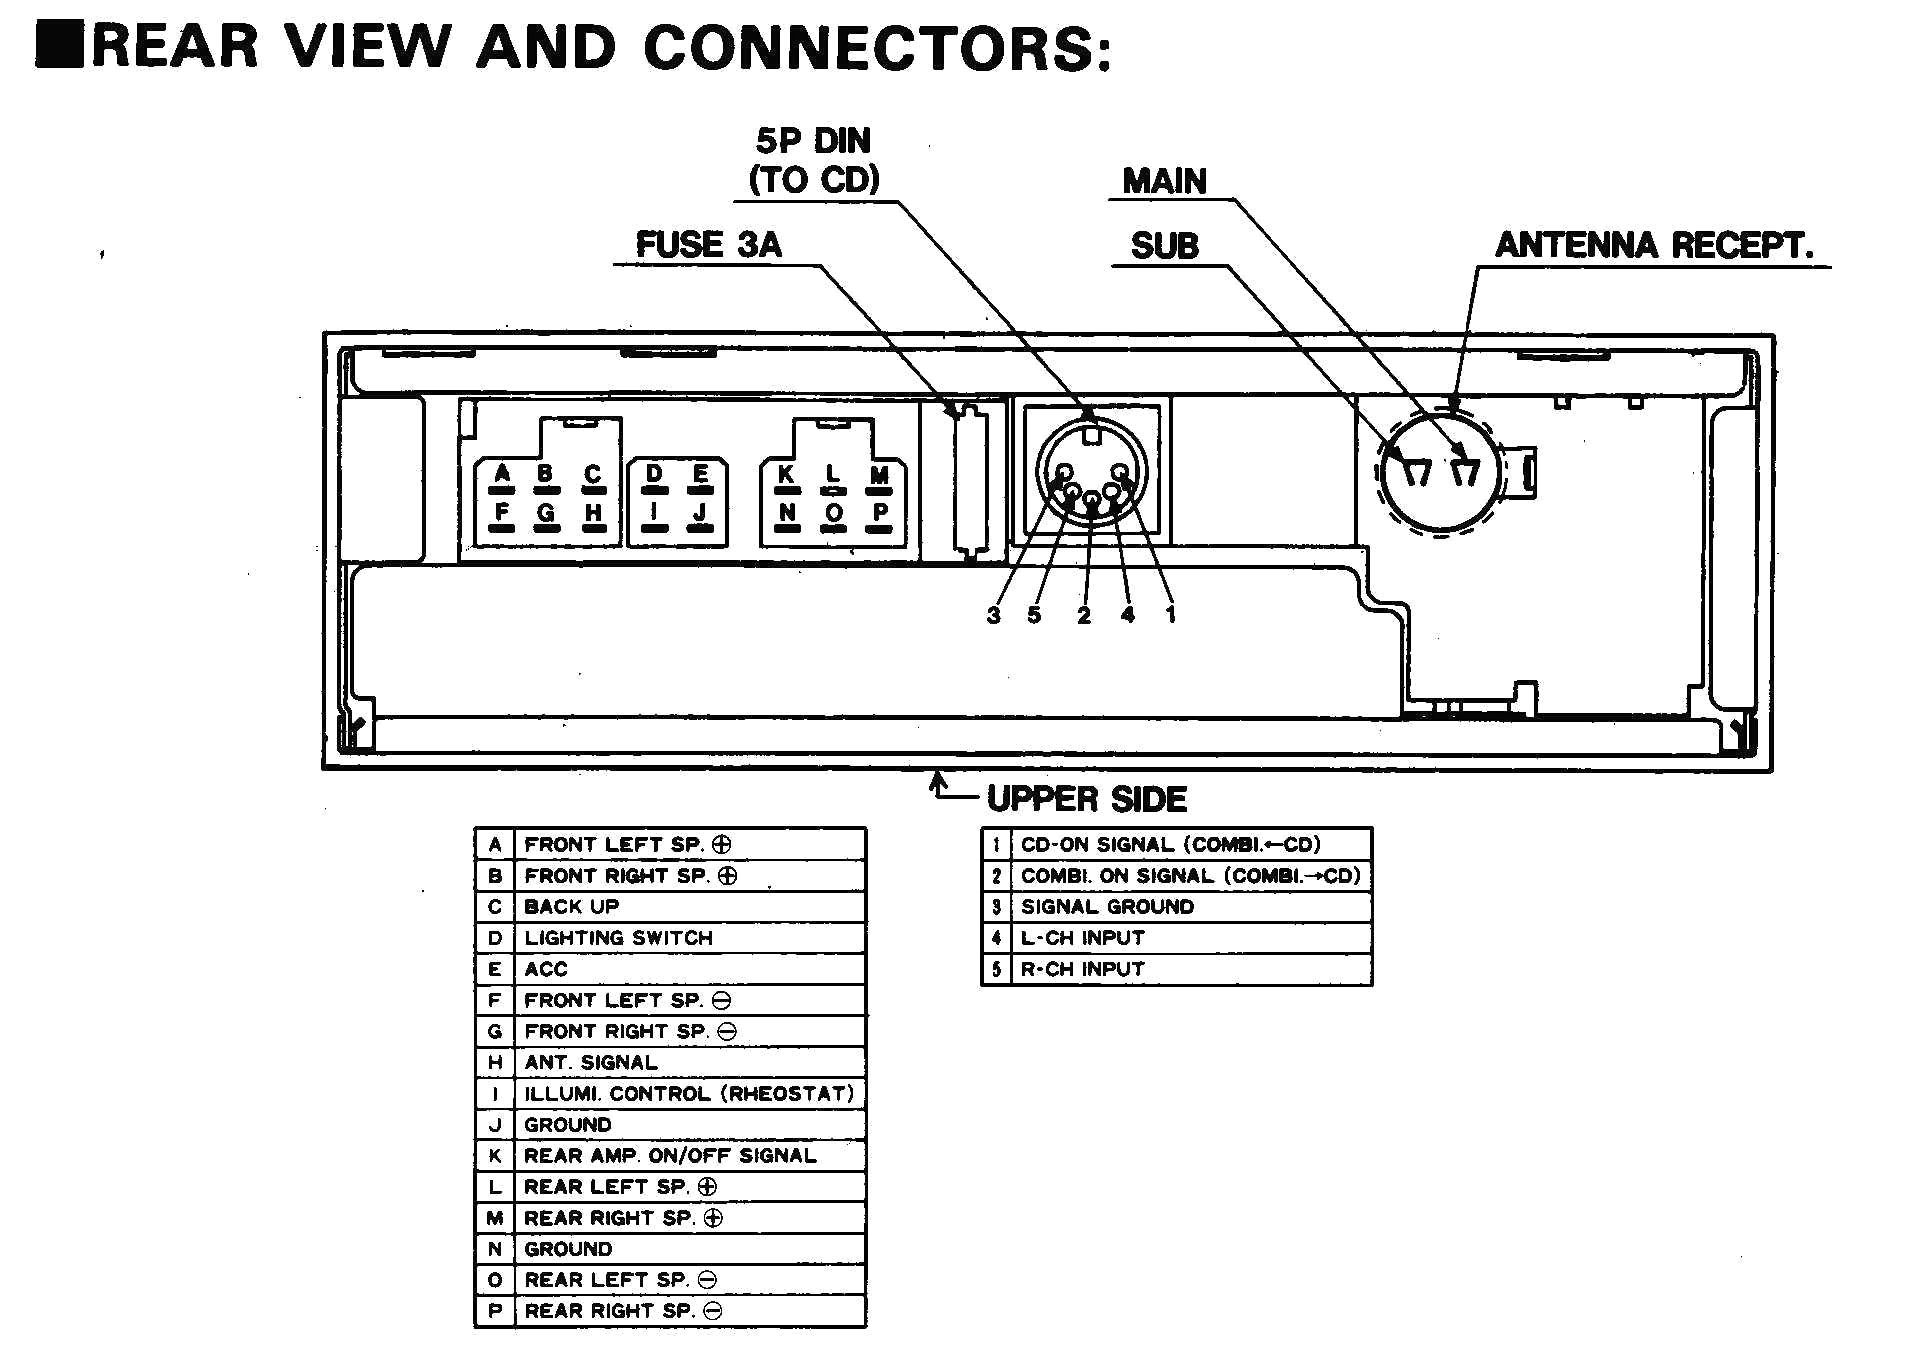 Hyundai Car Stereo Wiring Diagram Factory Car Stereo Wiring Diagrams In Jpg Striking Speaker Diagram Of Hyundai Car Stereo Wiring Diagram